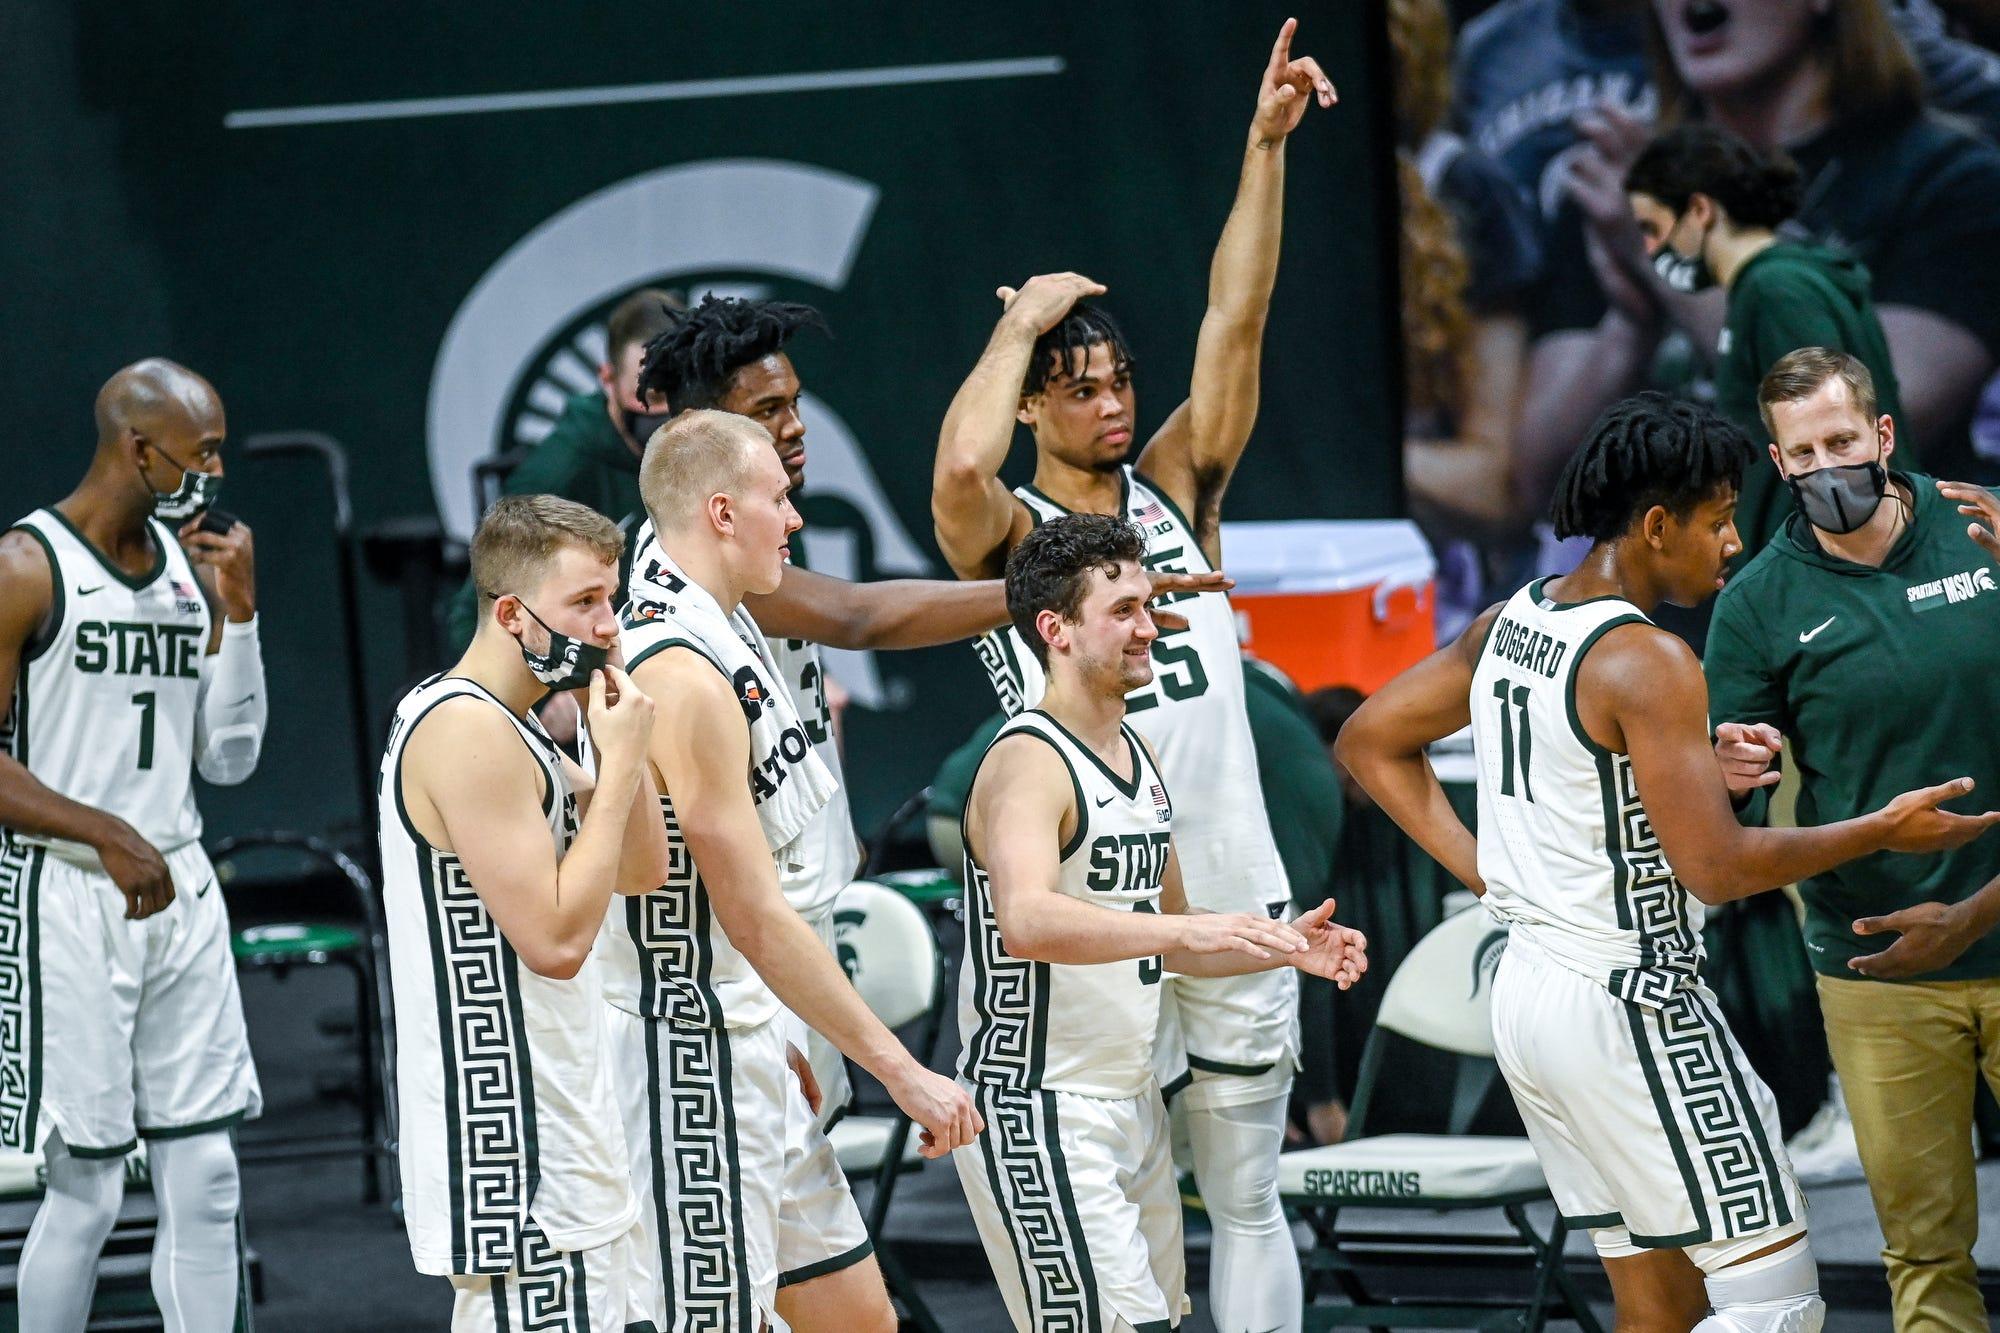 Thomas Kithier Michigan State Spartans Final Four Basketball Jersey - Green